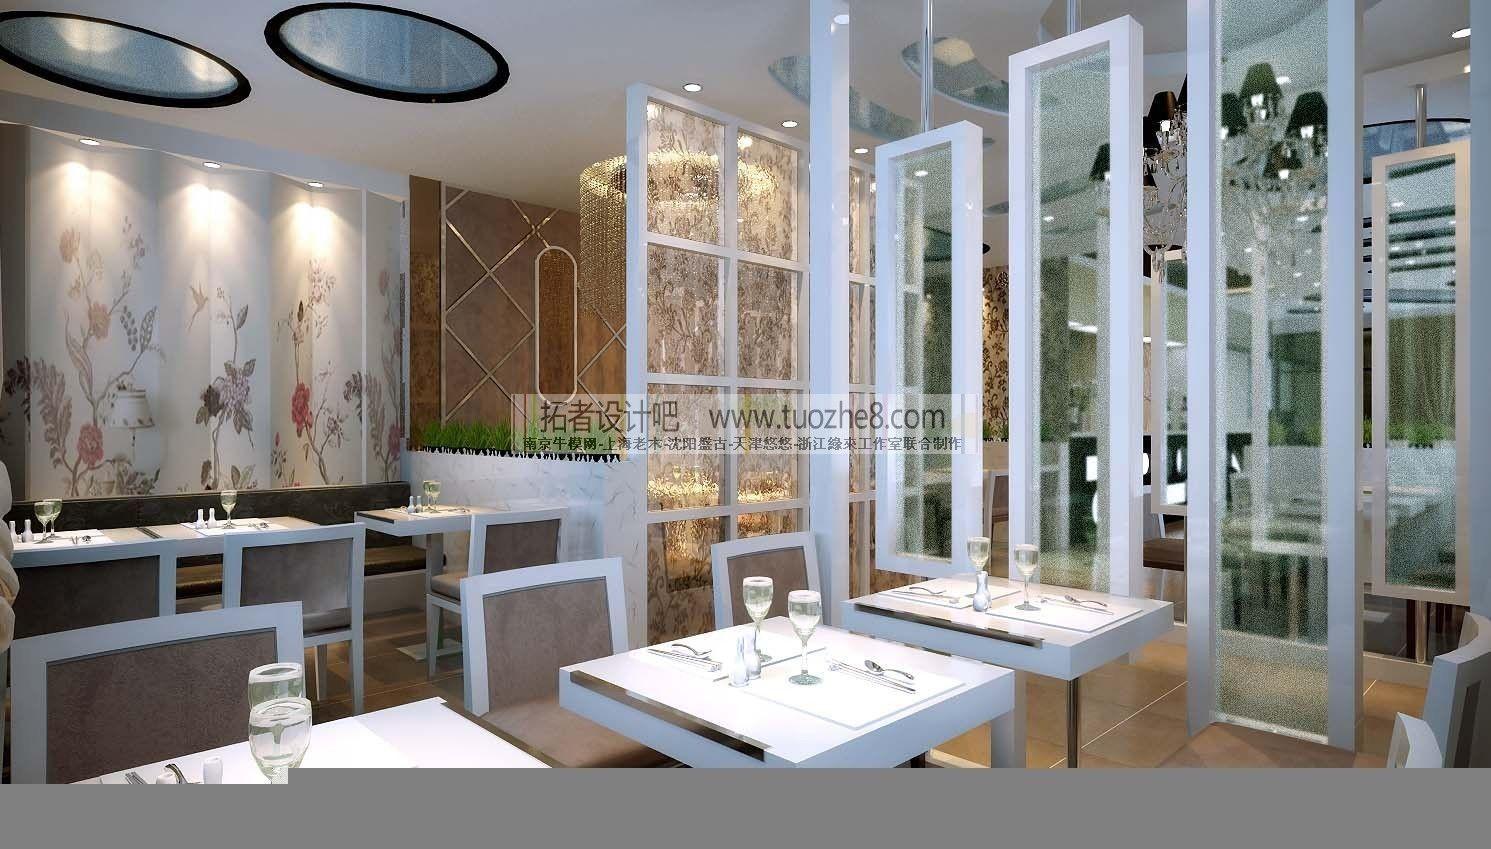 stylish interior design living room restau 3d model max stylish interior design living room restau 3d model max